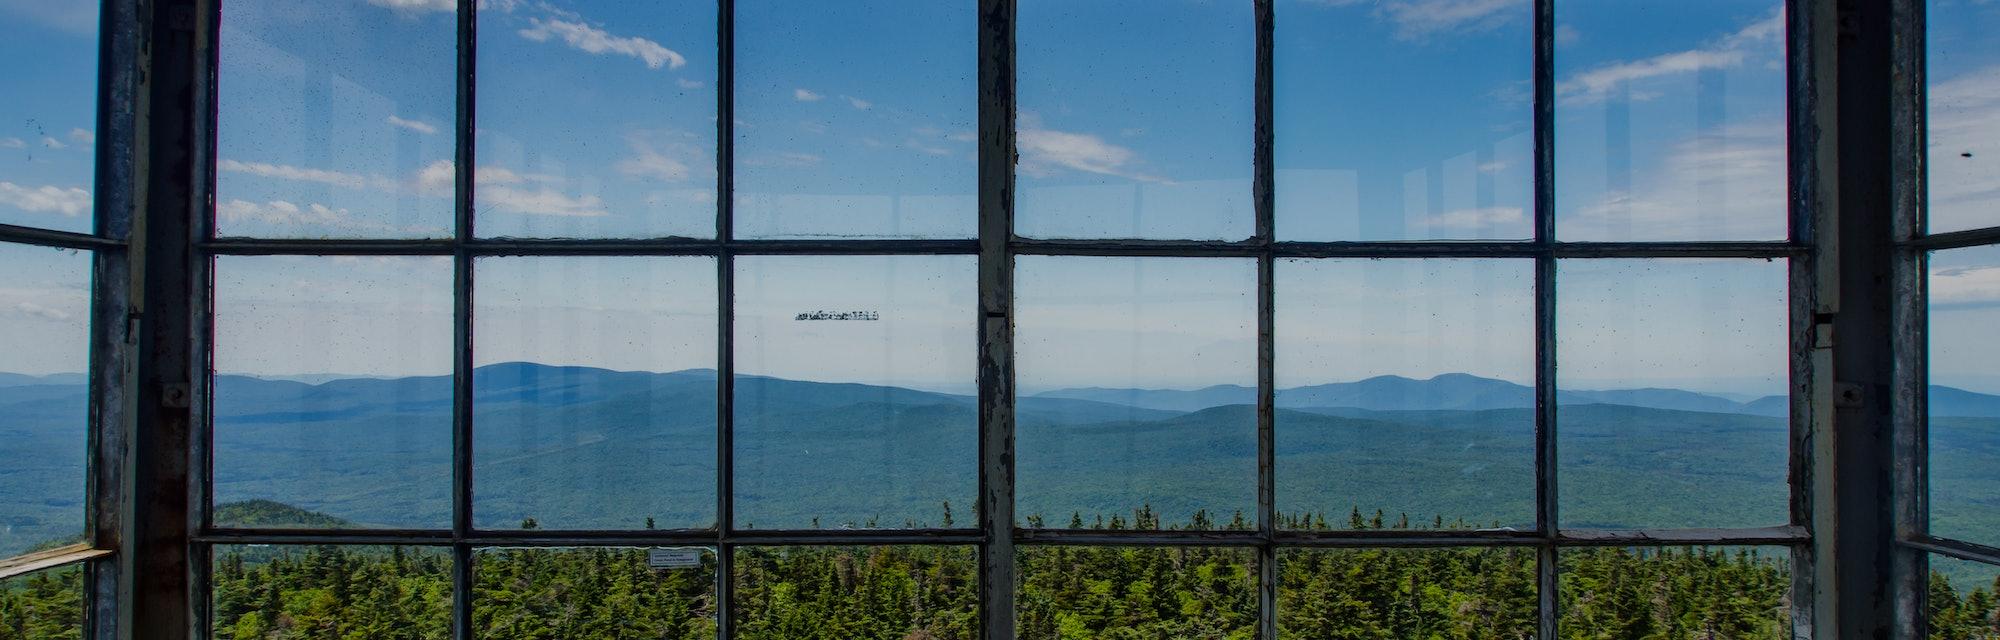 Fire Tower View, Stratton Mountain, Green Mountains, Vermont